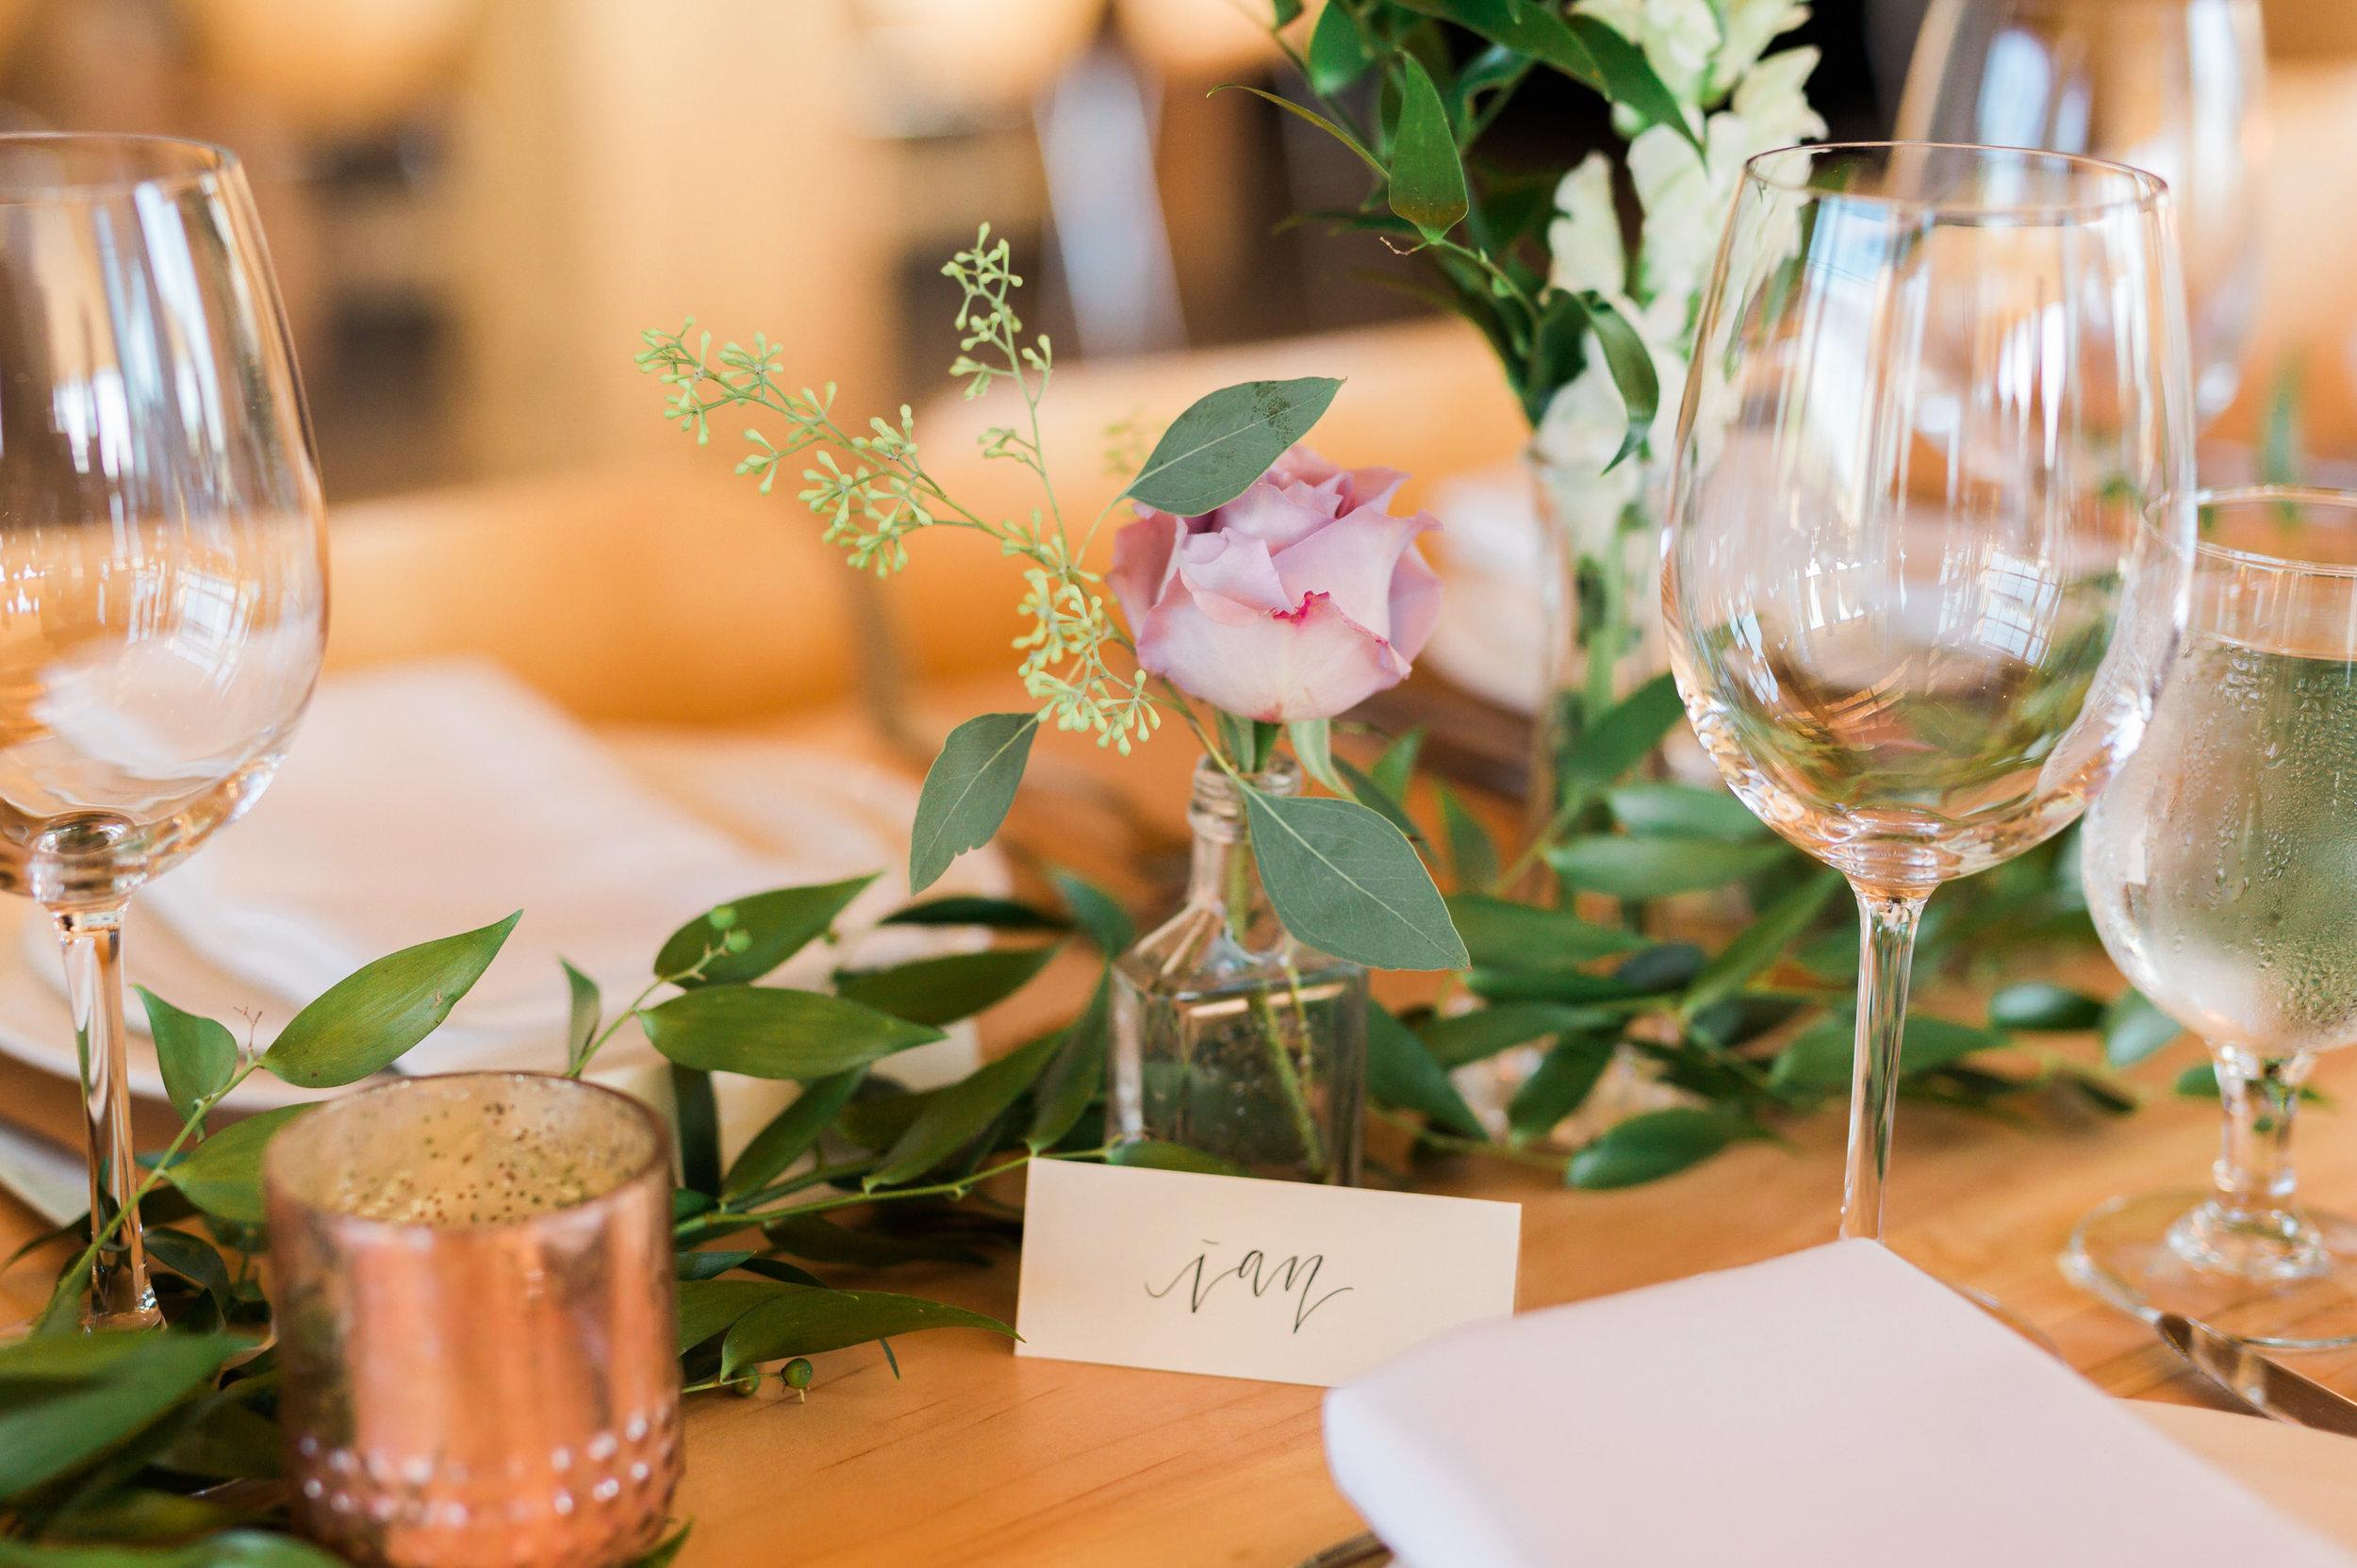 Squamish Wedding Photographer - Sea to Sky Gondola Wedding Photos -  Vancouver Wedding Photographer & Videographer - Sunshine Coast Wedding Photos - Sunshine Coast Wedding Photographer - Jennifer Picard Photography - IMG_4037.jpg